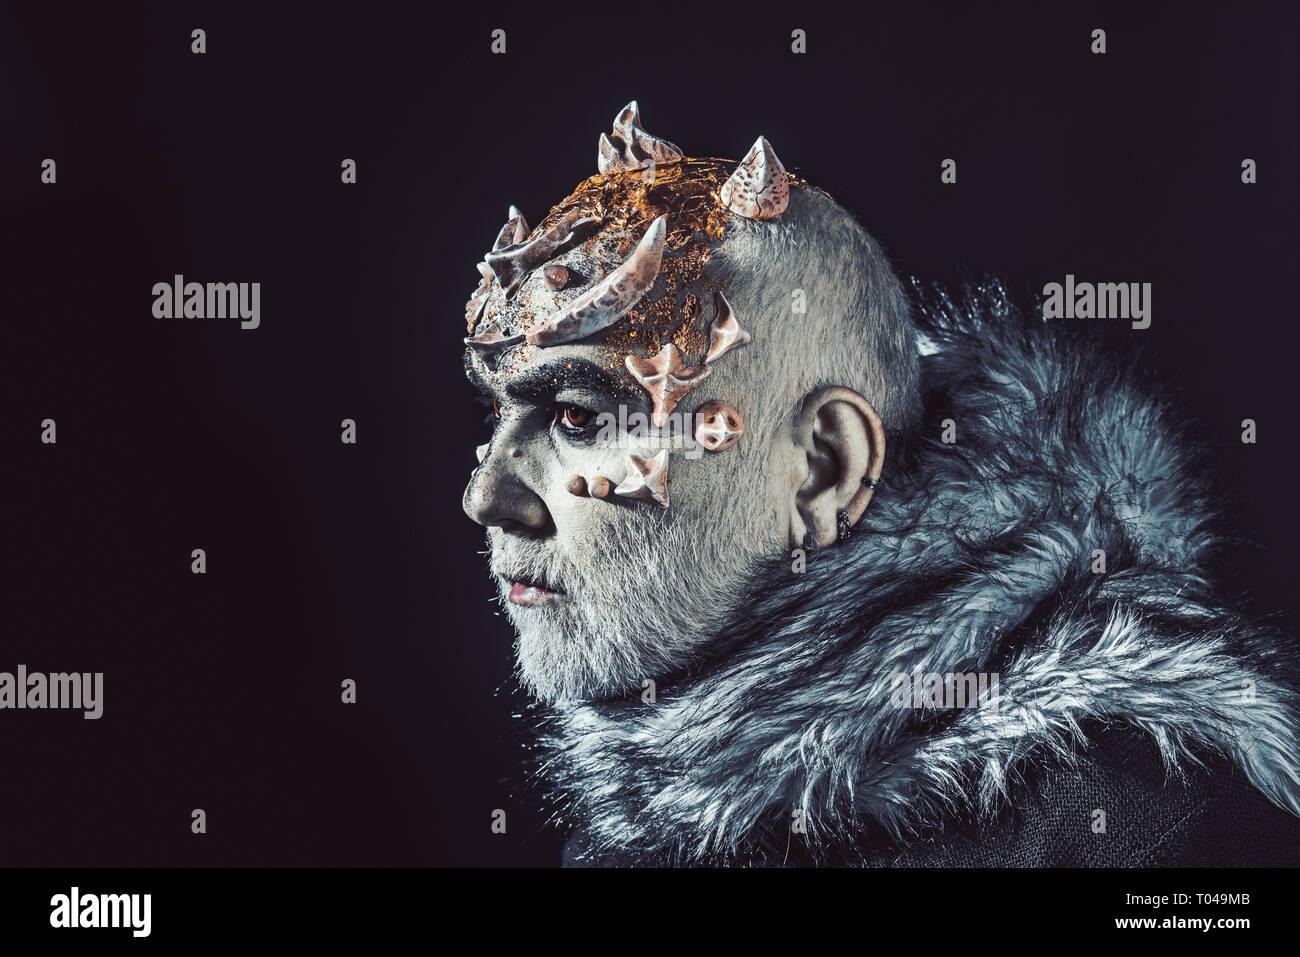 Alien, demon, sorcerer makeup. Demon on black background, copy space. Theatrical makeup concept. Senior man with white beard dressed like monster. Man - Stock Image